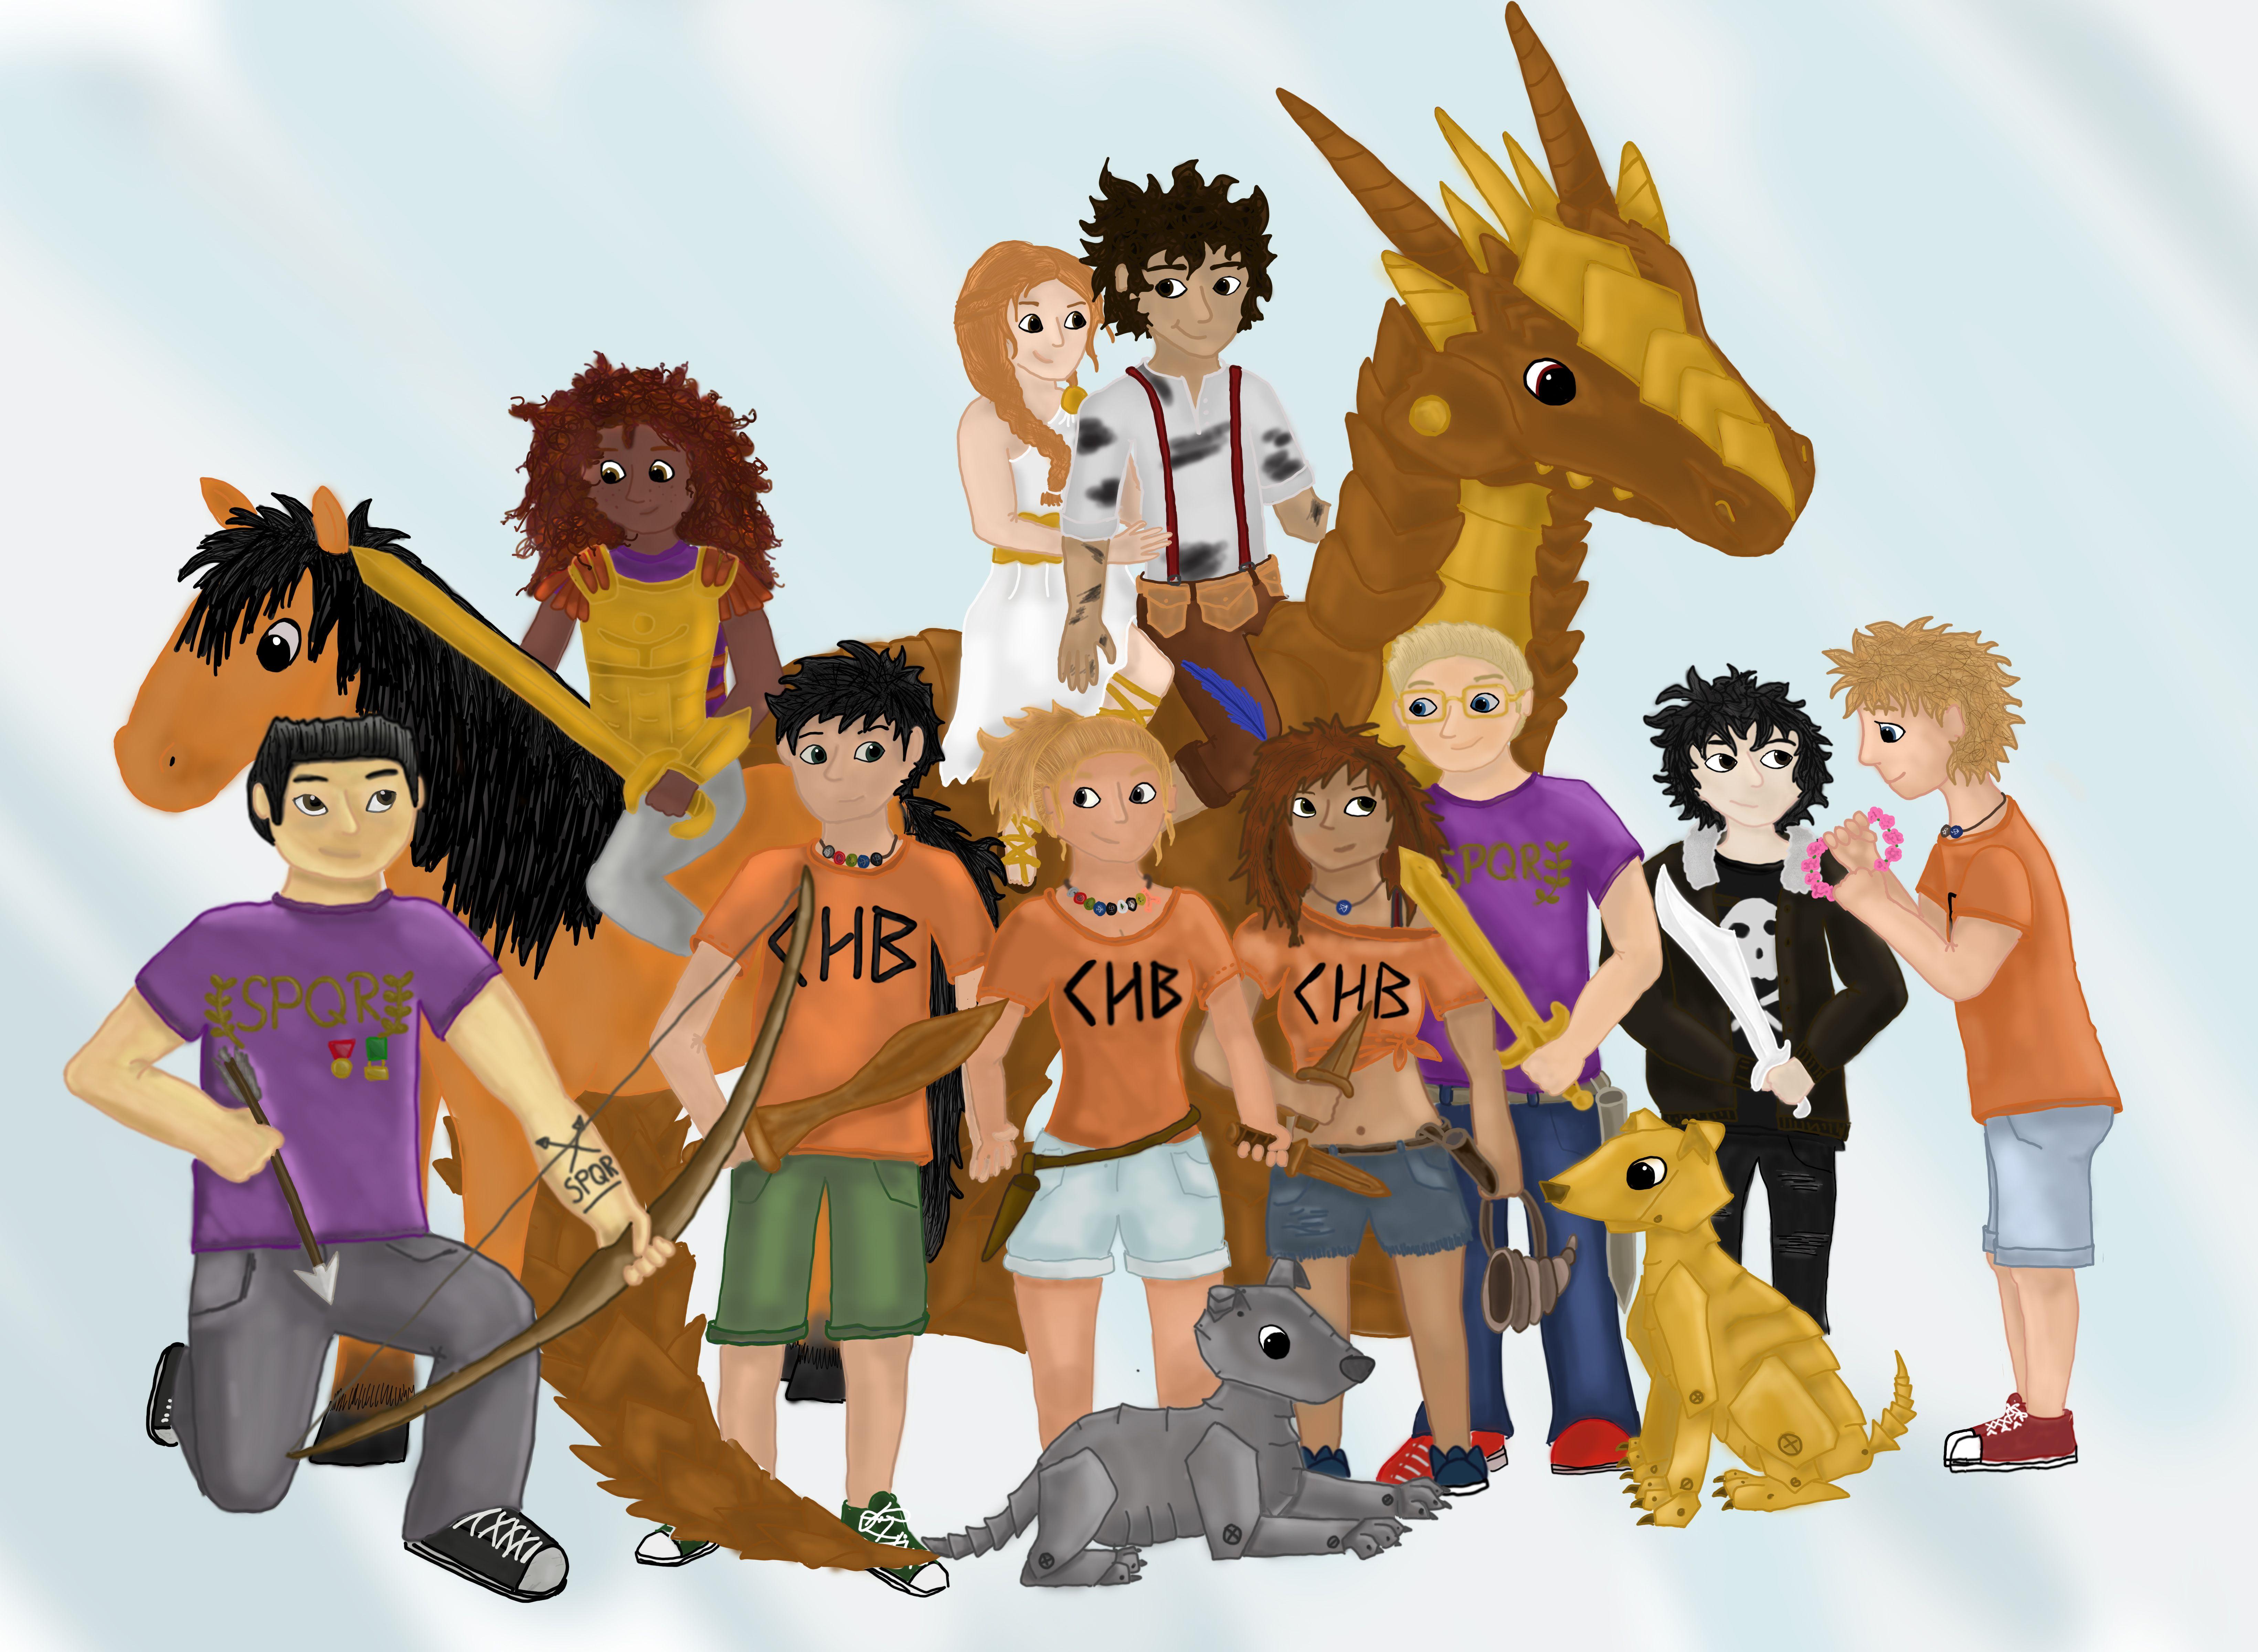 Heroes of olympus percy jackson percy jackson fan art